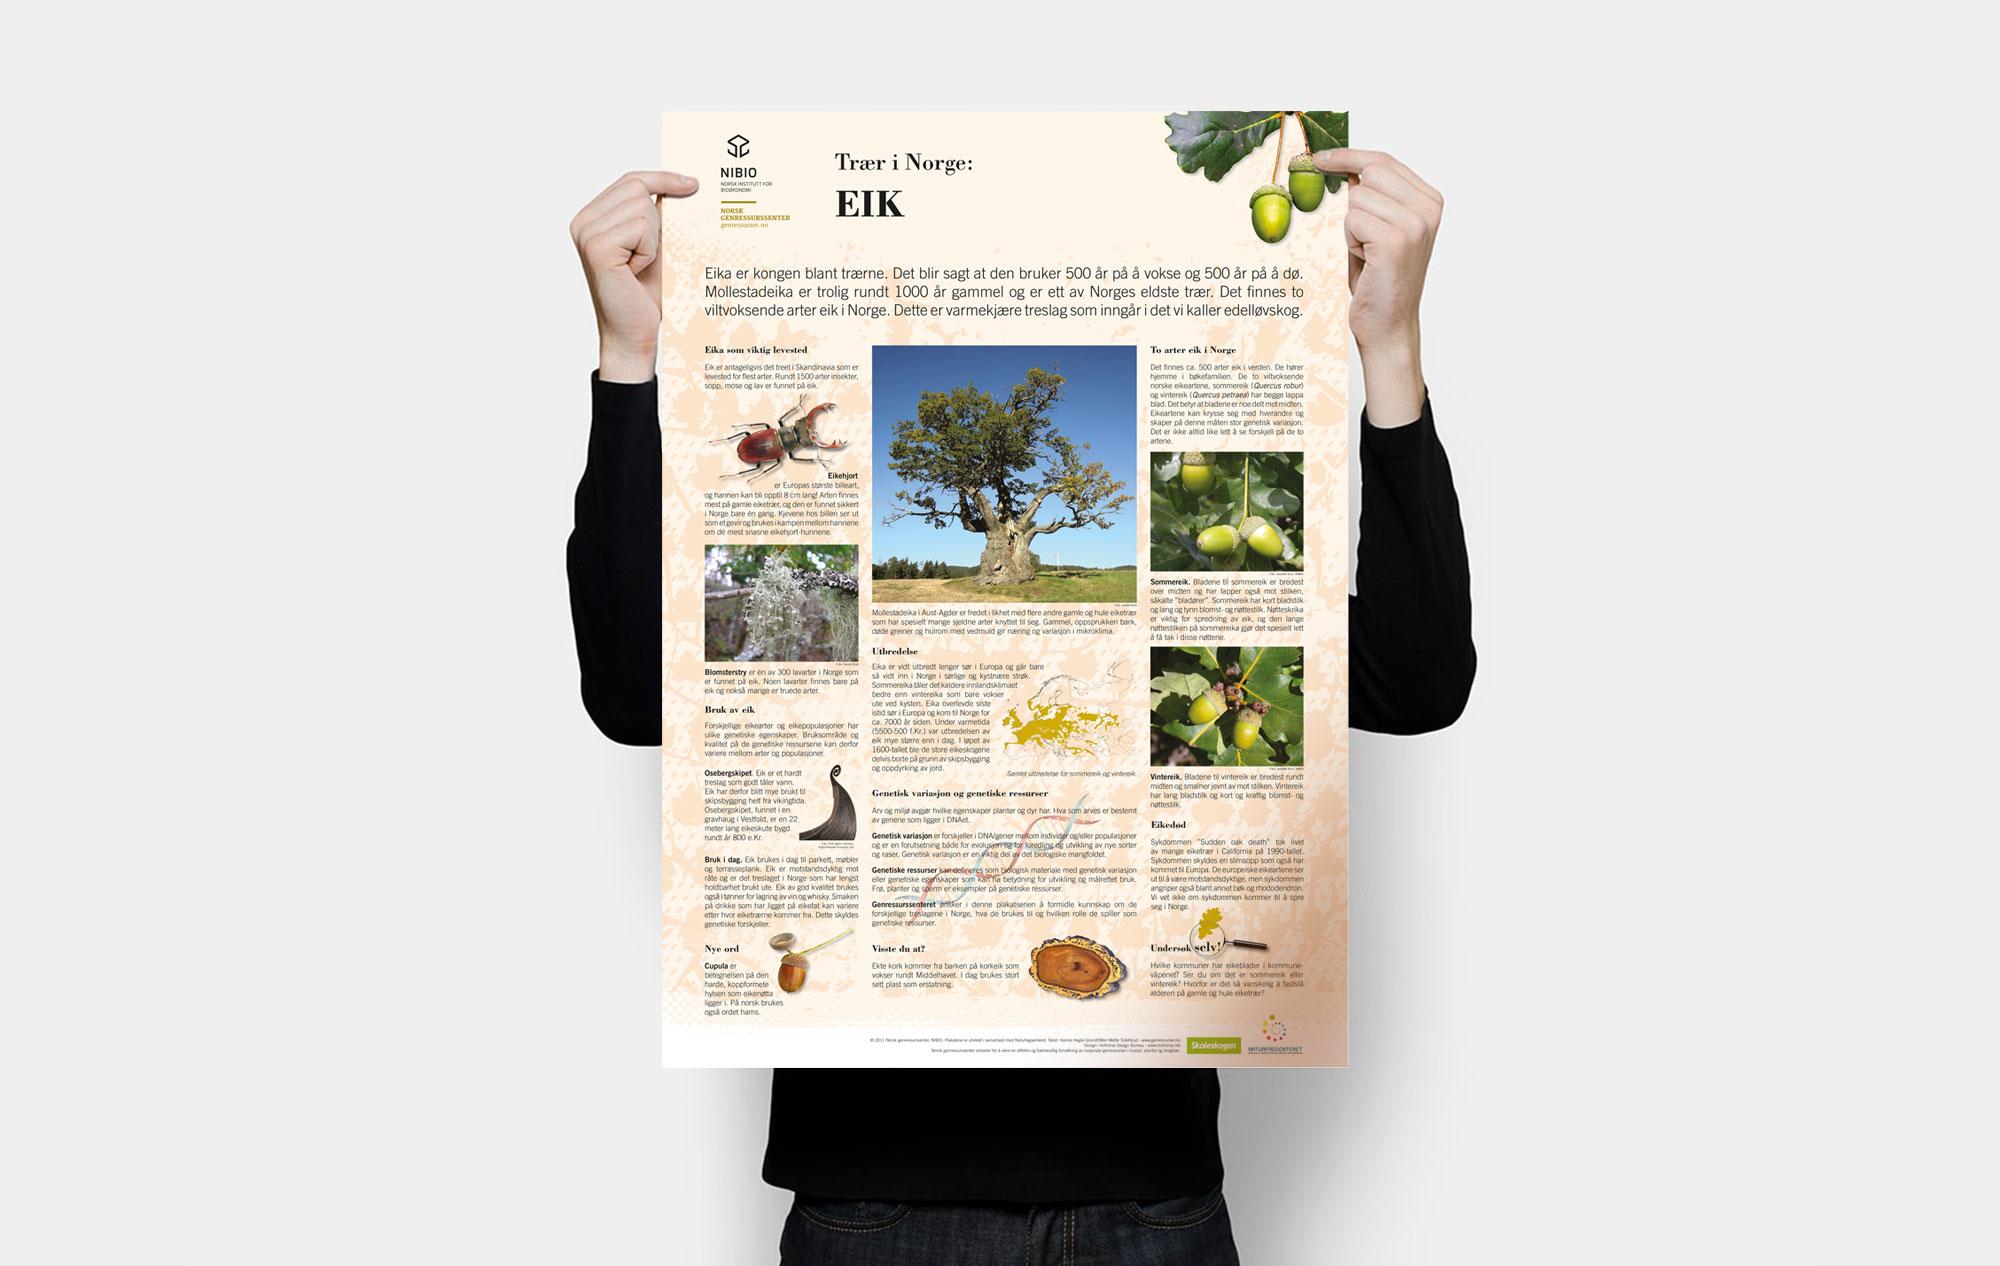 nibio trees presentation